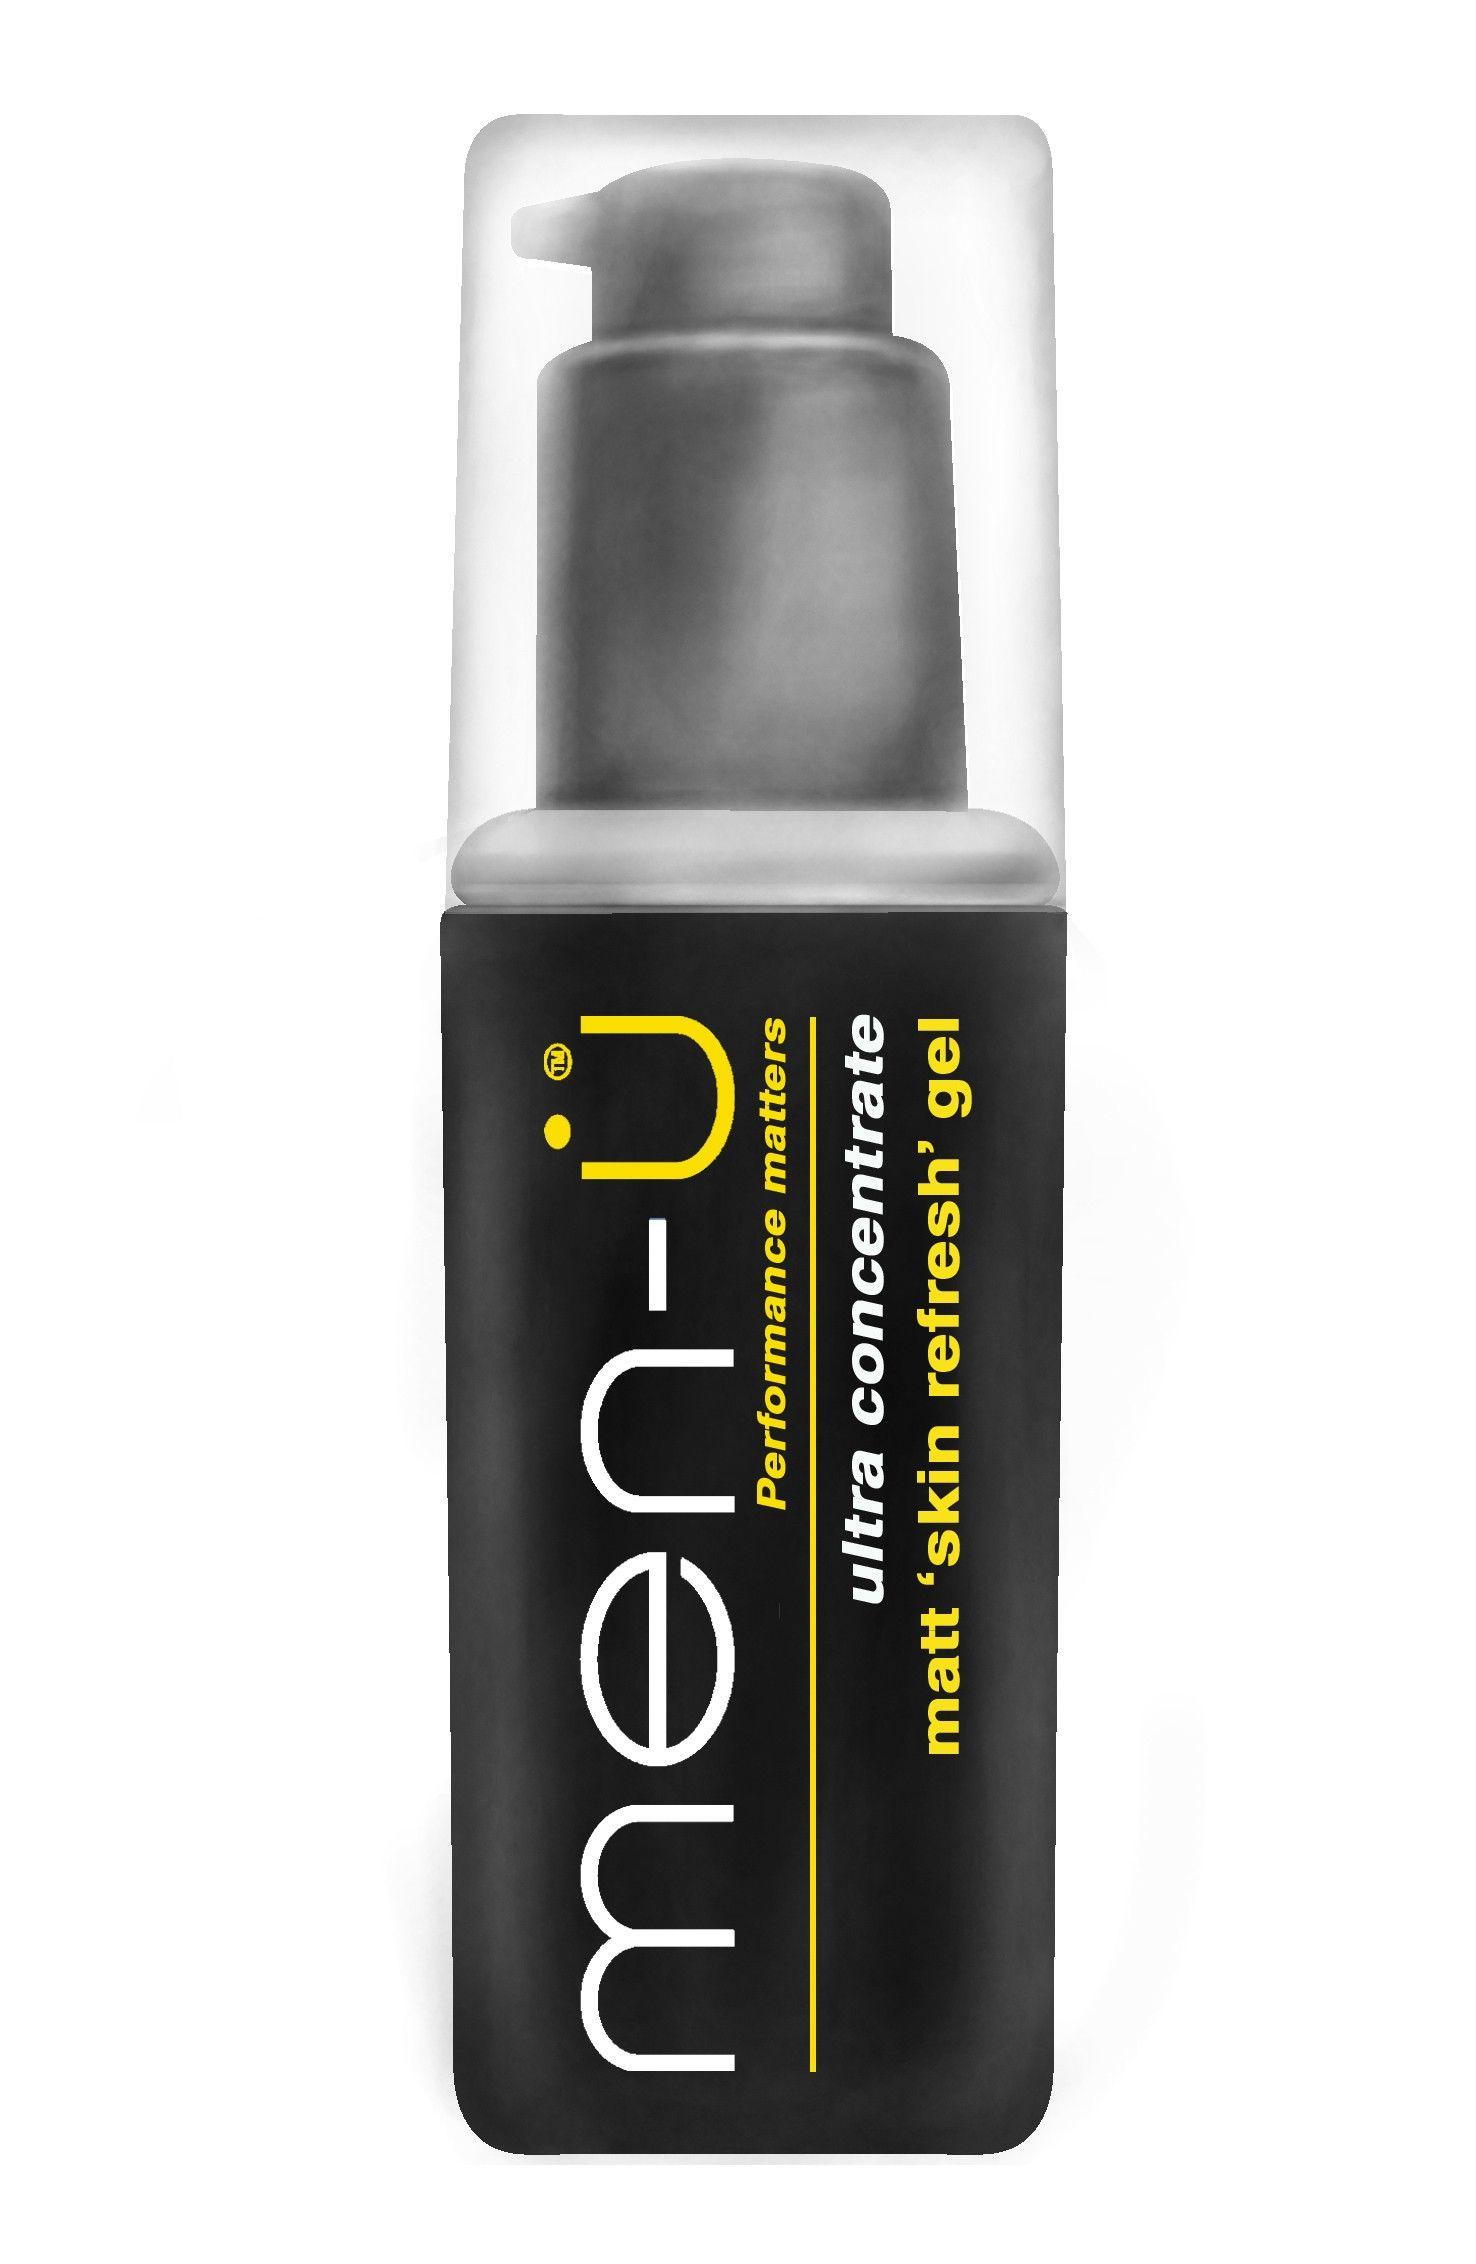 Men U Matt Skin Refresh Gel 100ml Hair Scalp Shampoo Scalp Shampoo Skin Gel